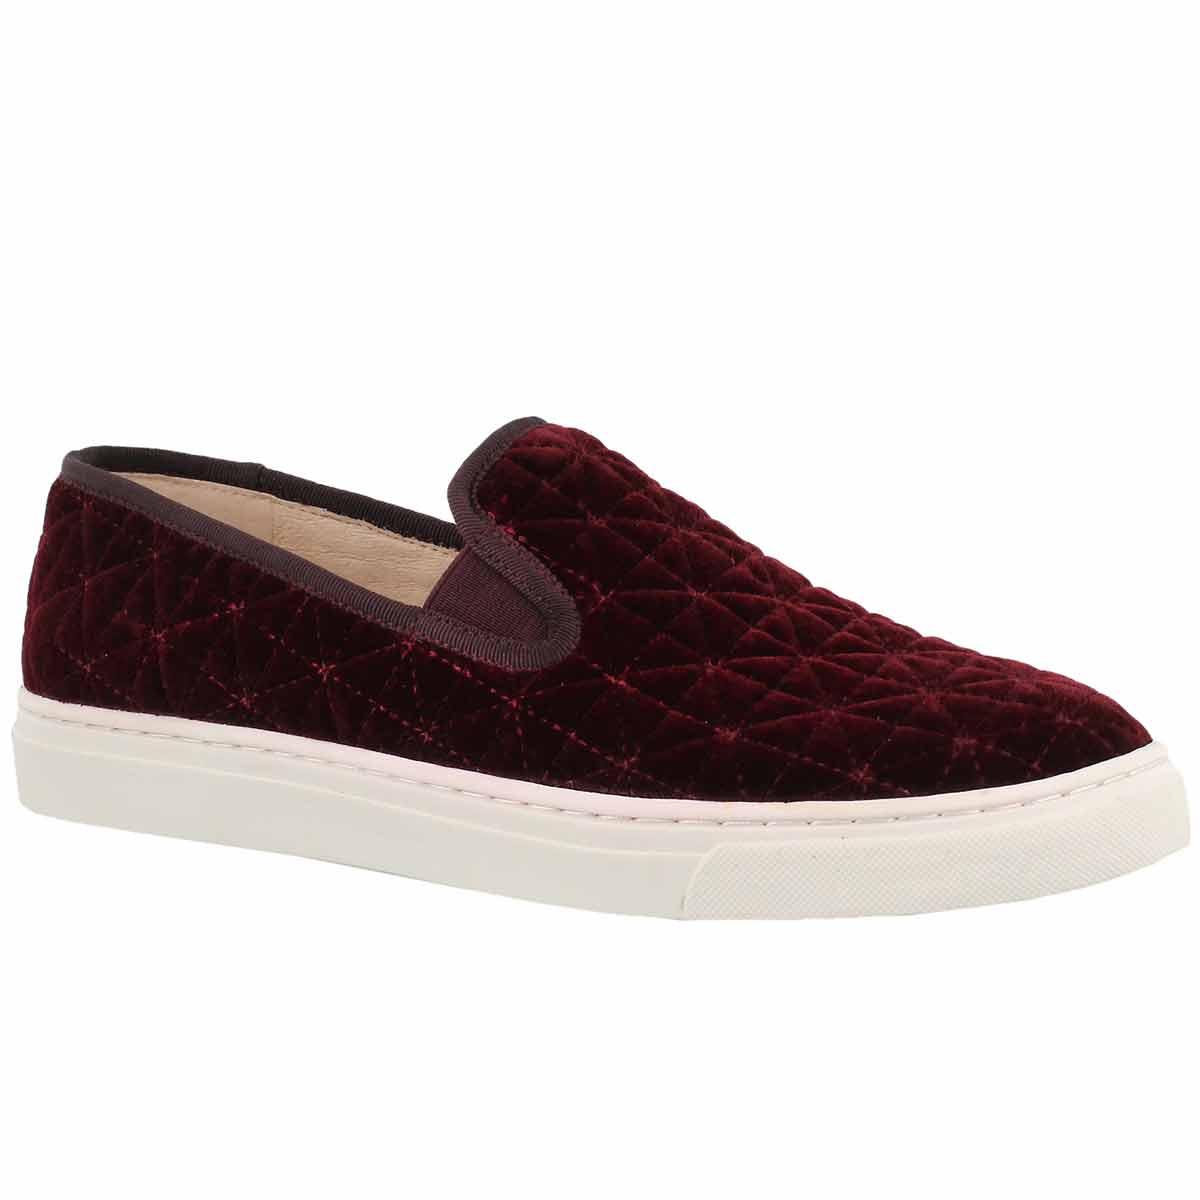 Women's BILLENA wine casual slip on shoes